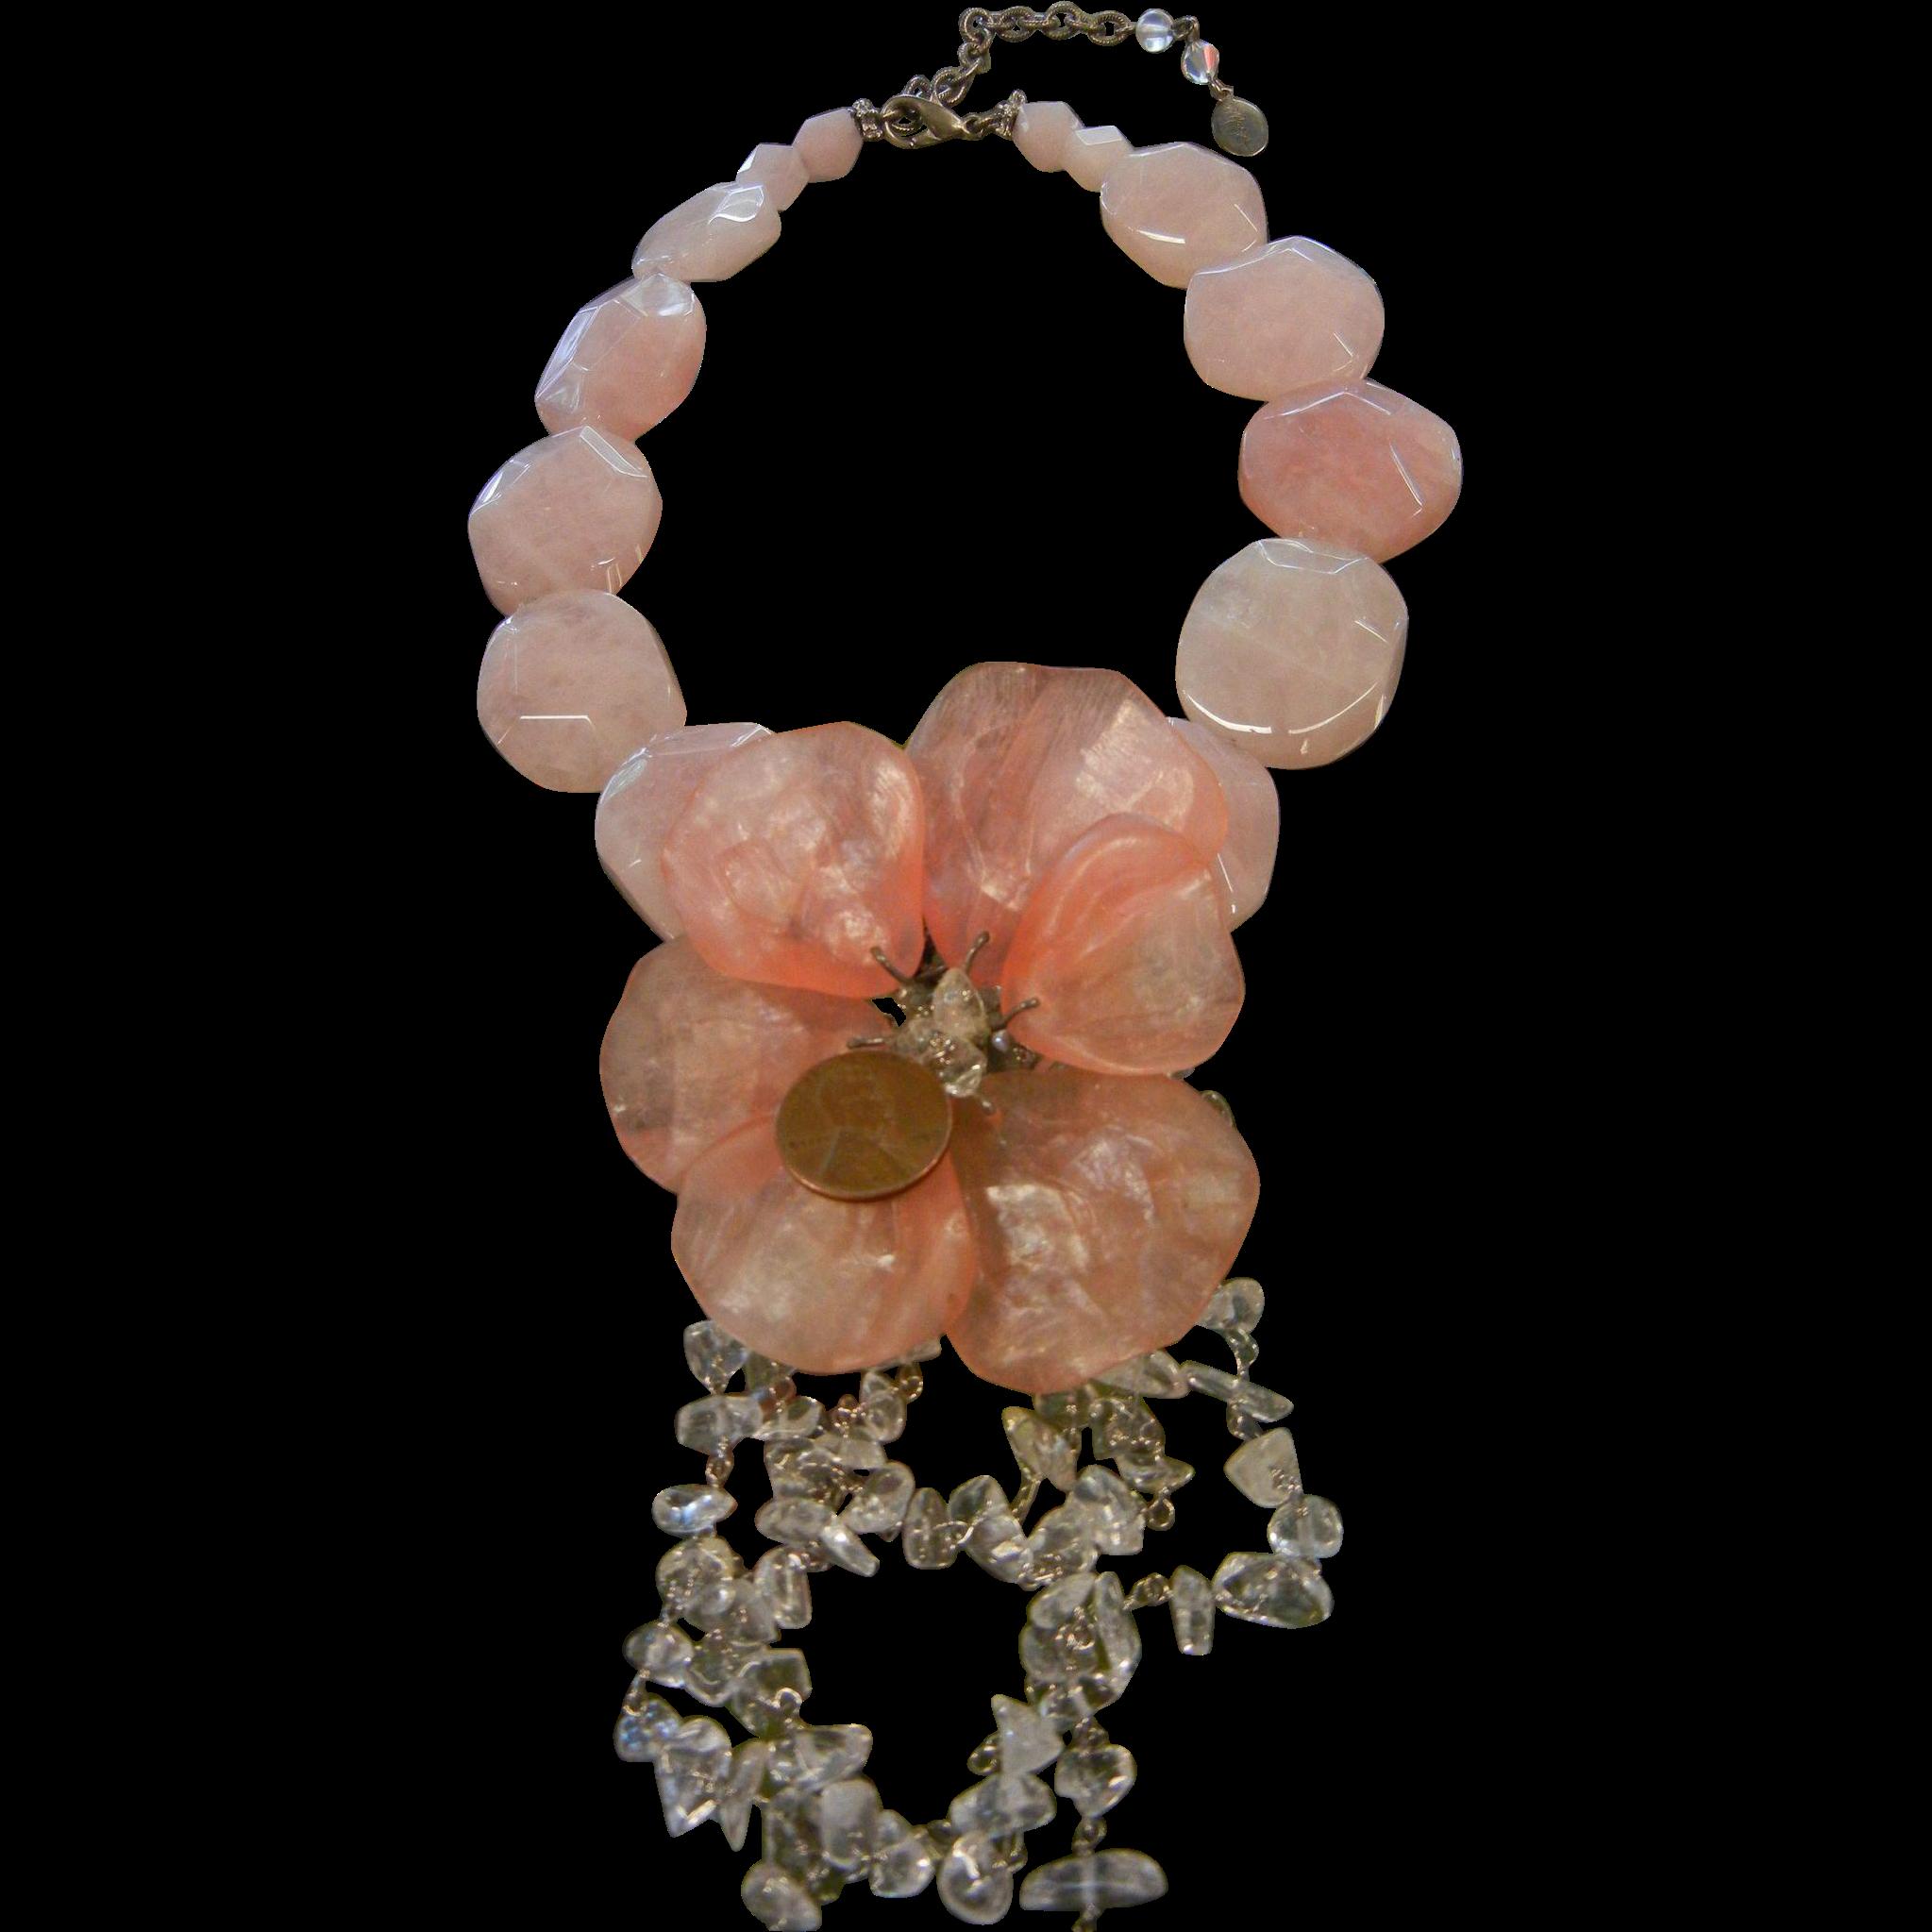 MAYA Designer Statement Necklace w/ Faceted Natural Rose Quartz